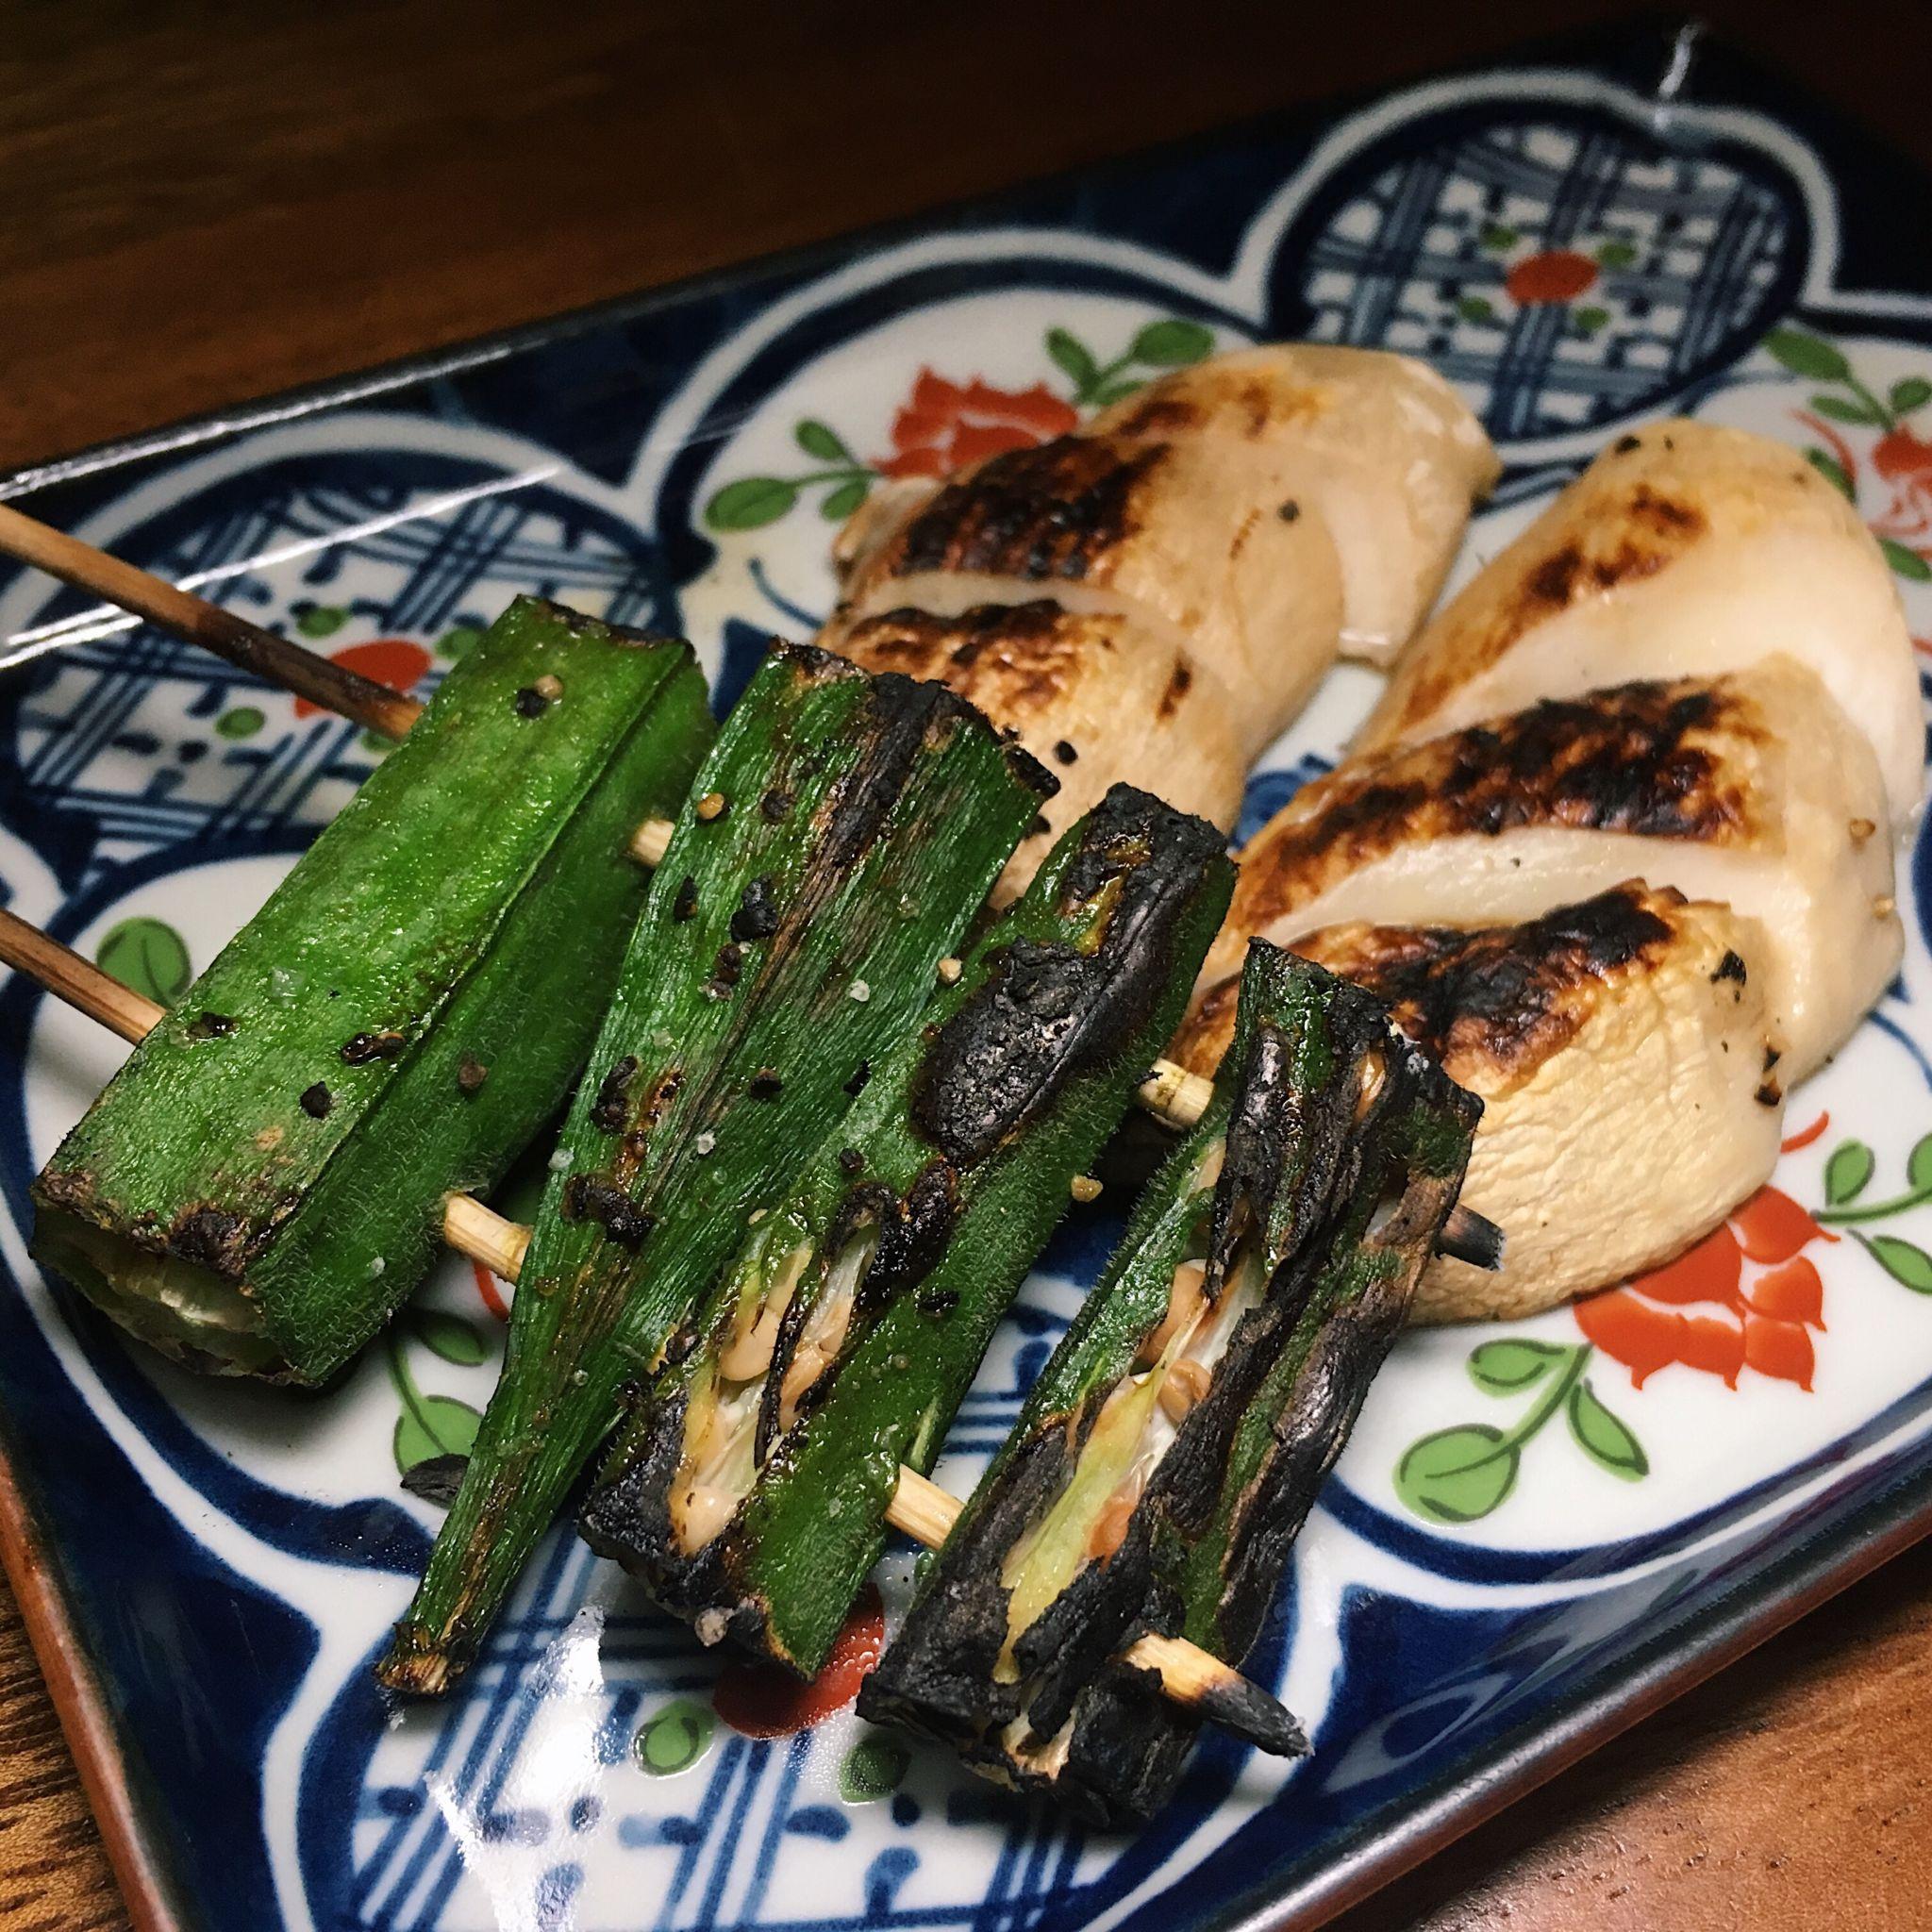 Okra and Oyster Mushroom - Kimoto Gastro Bar